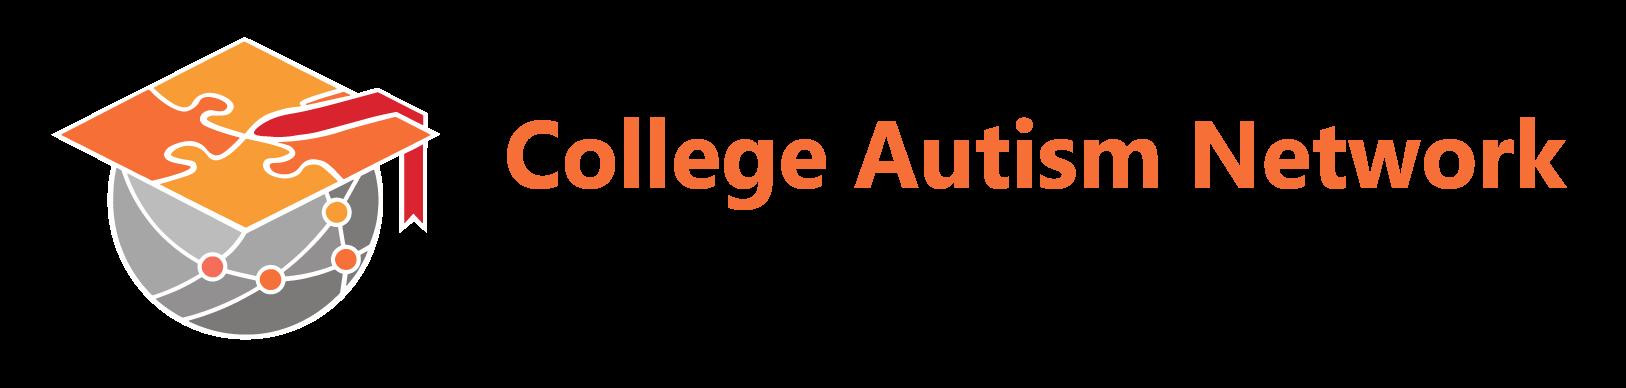 College Autism Network